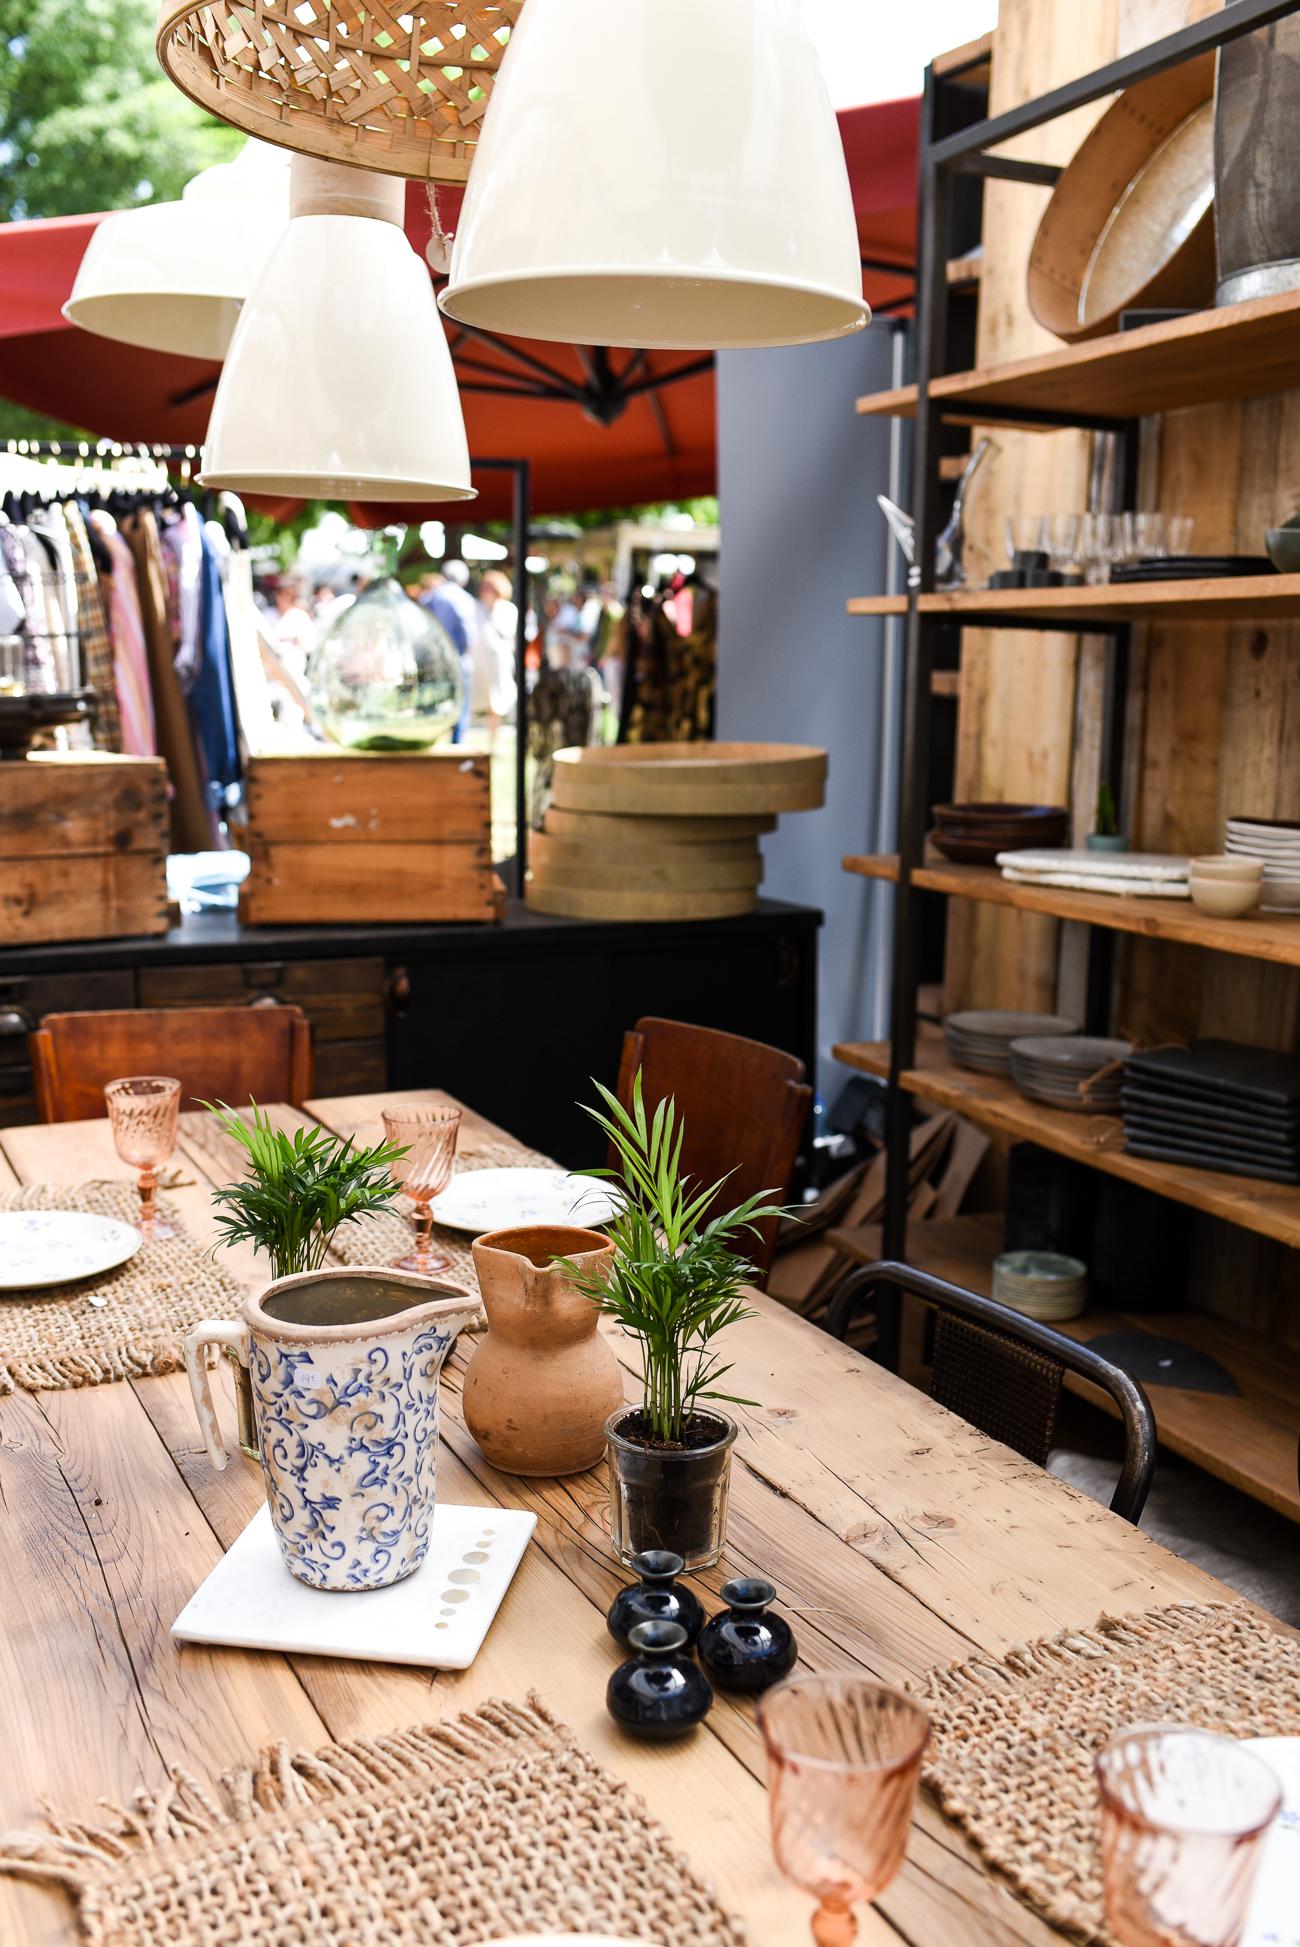 le-studio-twinky-photographe-salon-vivre-cote-sud-2019-aix-en-provence-17.jpg